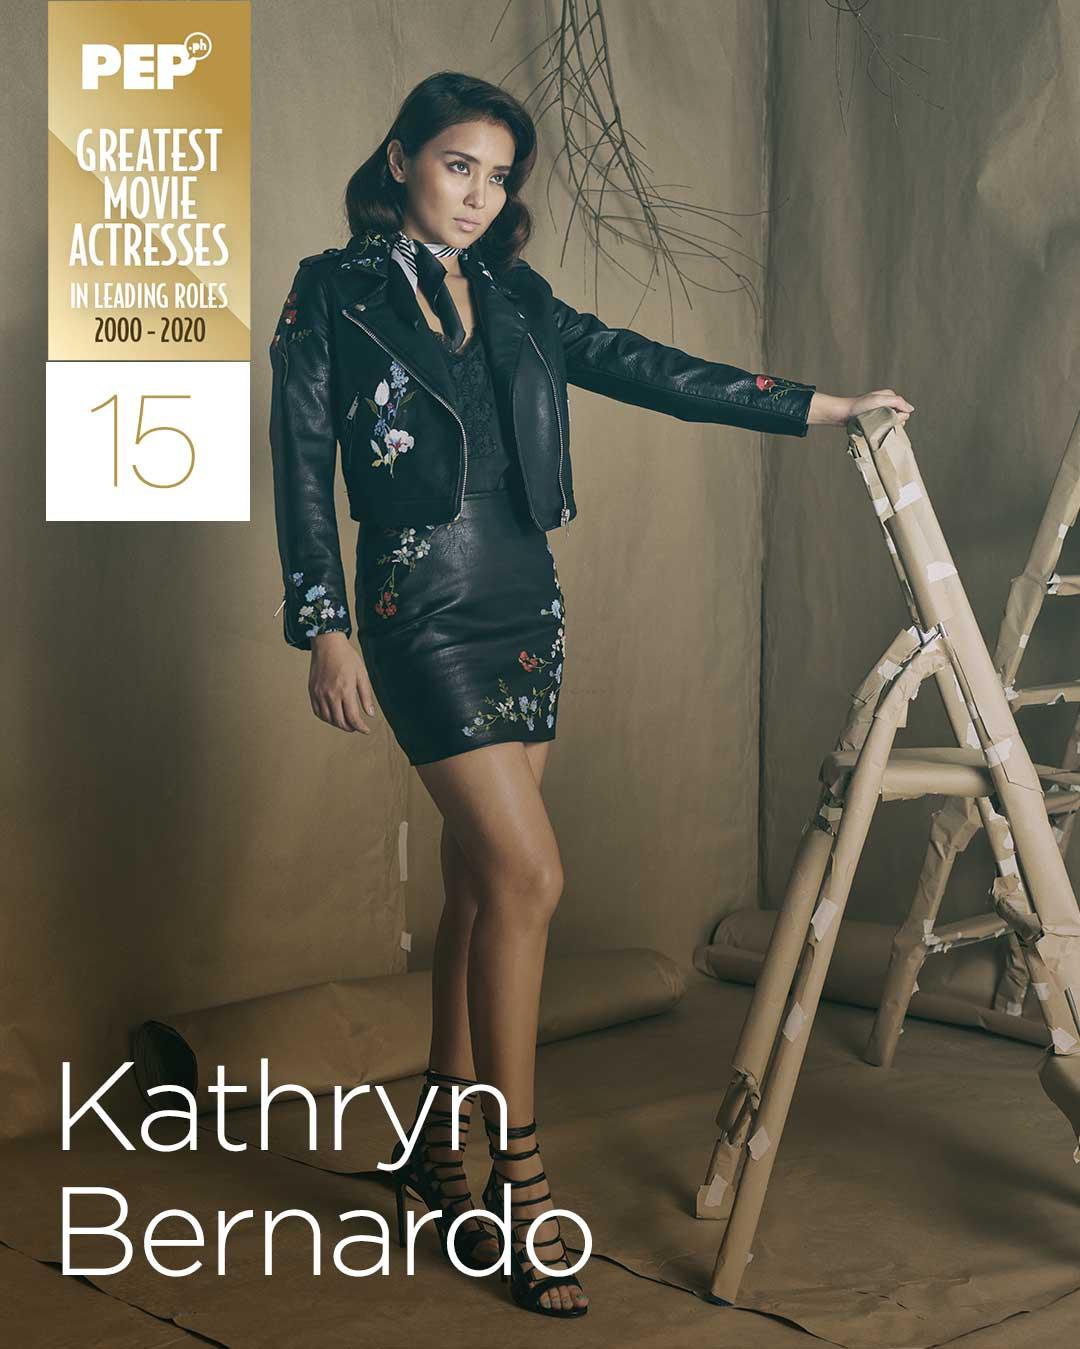 Kathryn Bernardo, 15 Greatest Movie Actresses